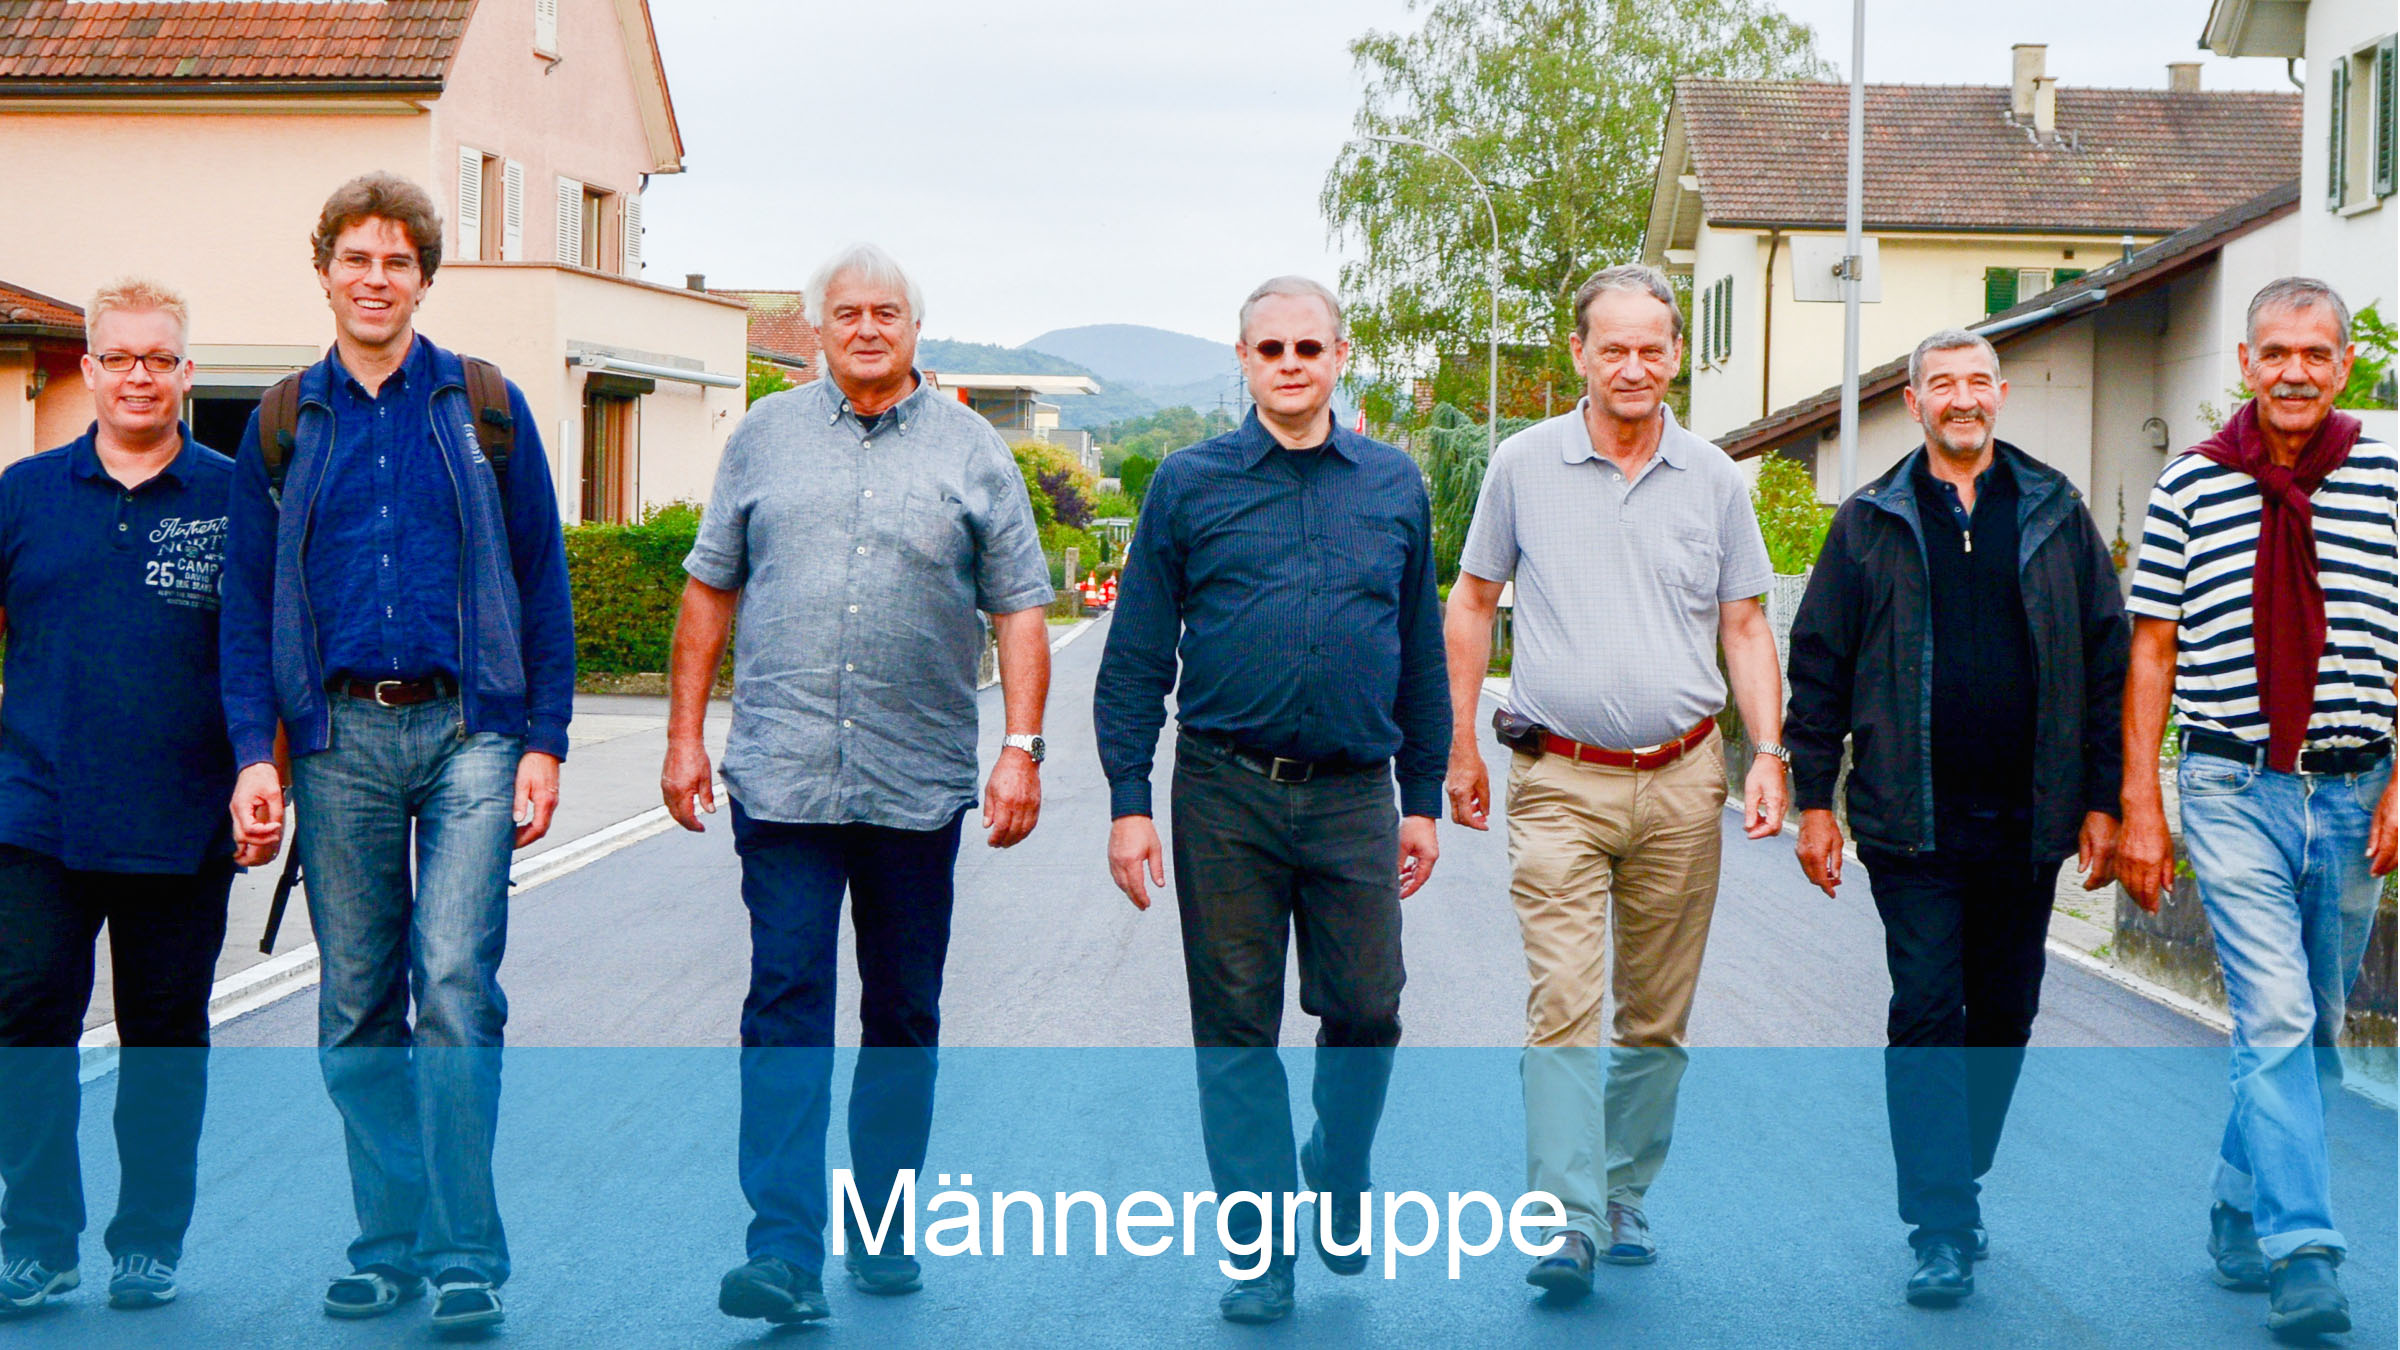 Männergruppe der Reformierten Kirche Mittleres Fricktal